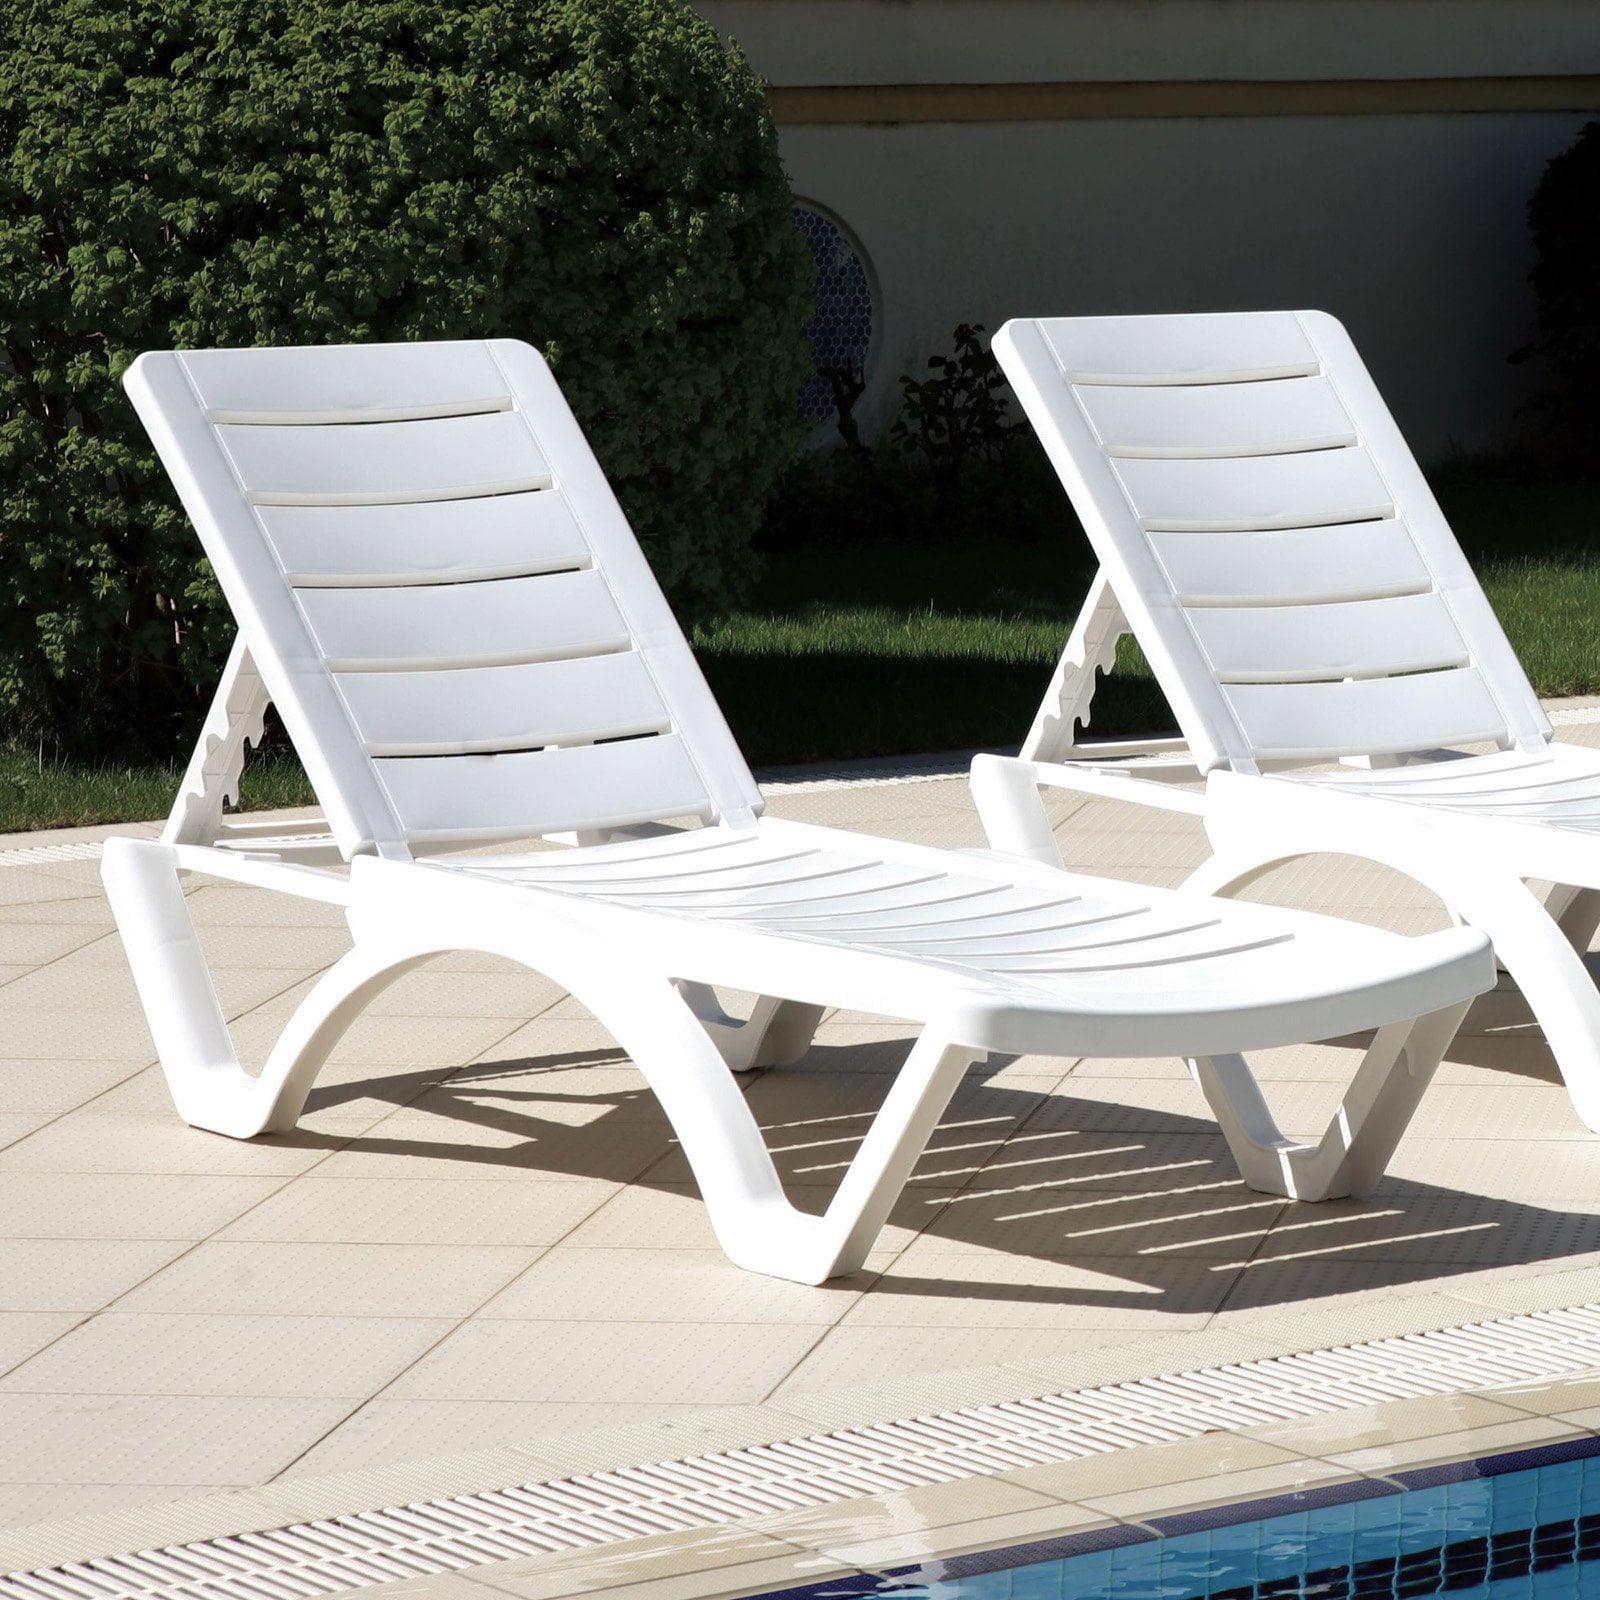 Compamia Aqua Pool Chaise Lounge Set of 4 by Compamia